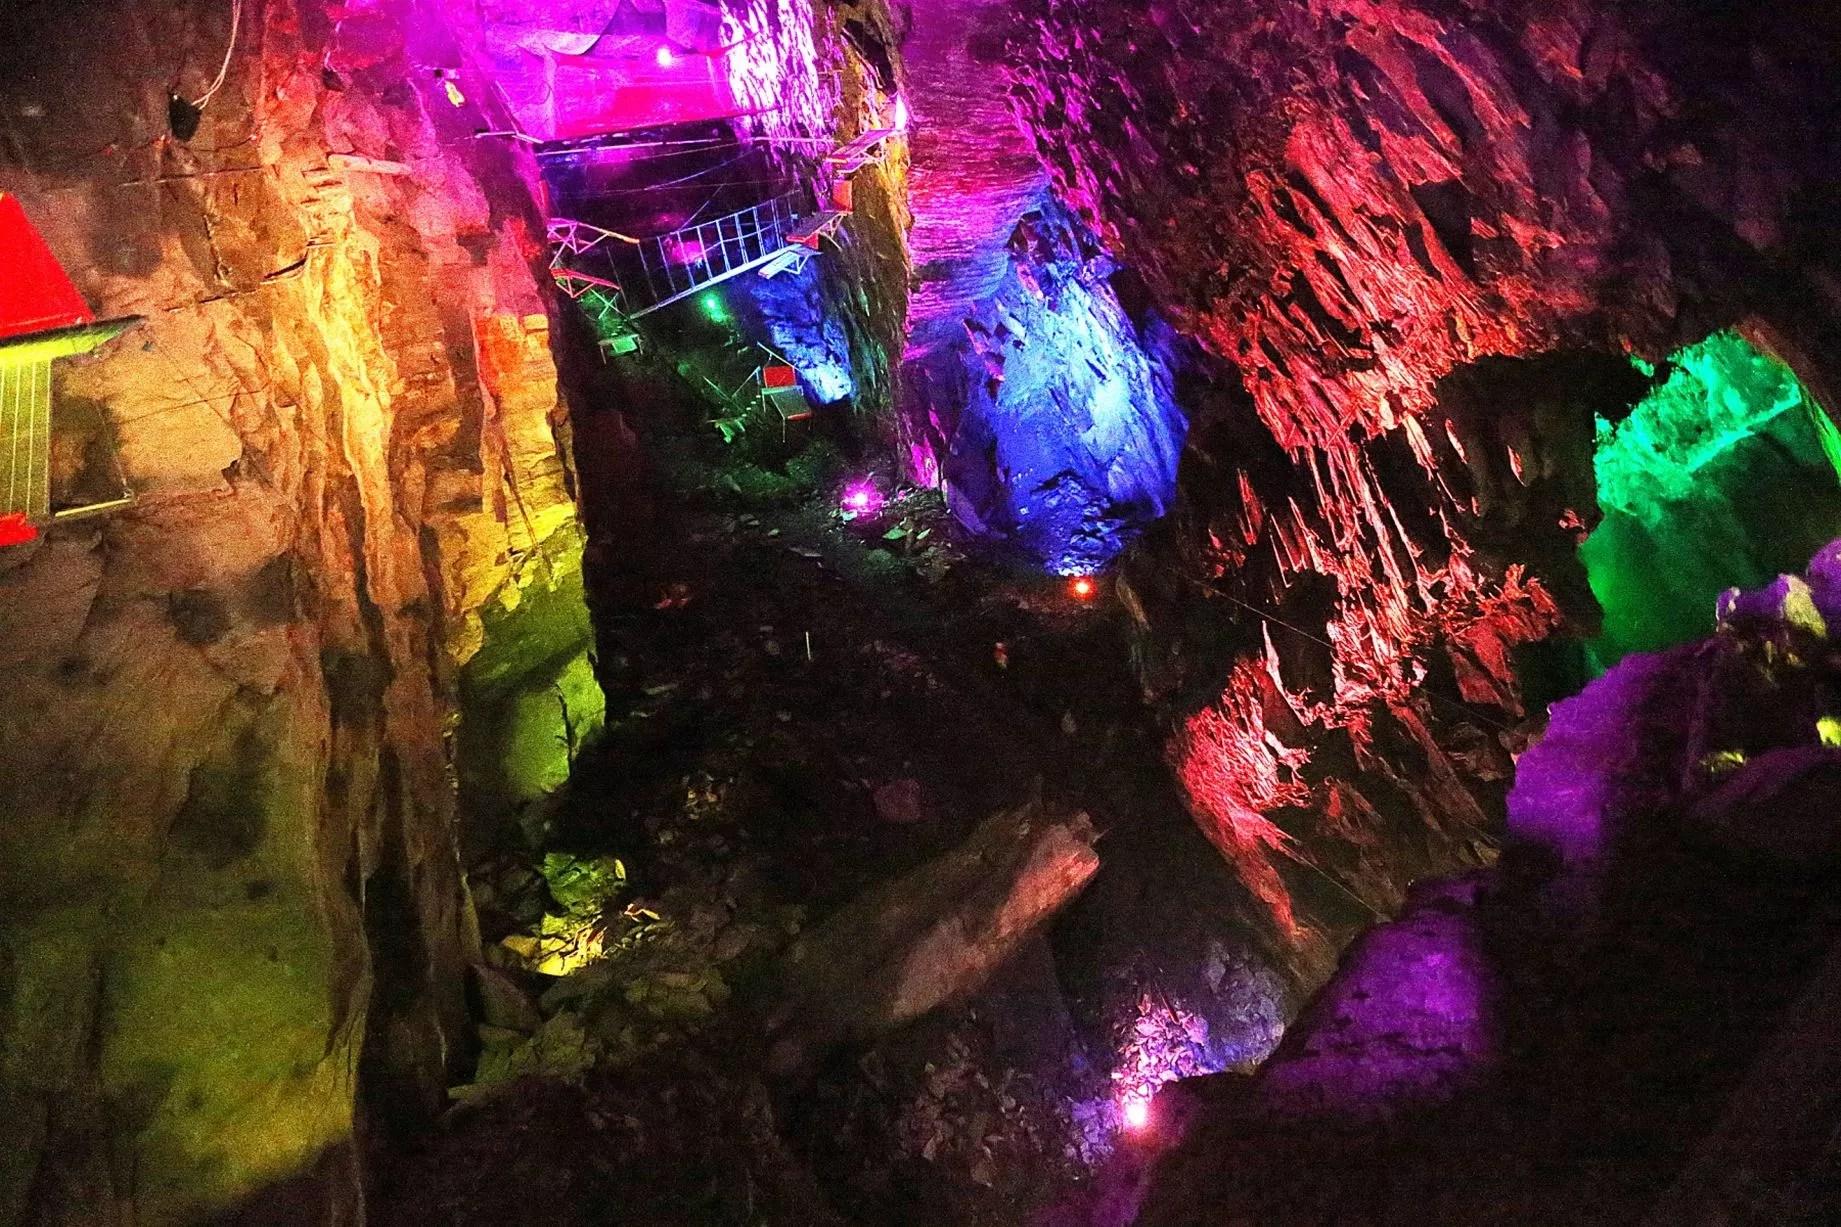 4 man zip wire wales simple flower diagram world caverns opens at blaenau ffestiniog daily post